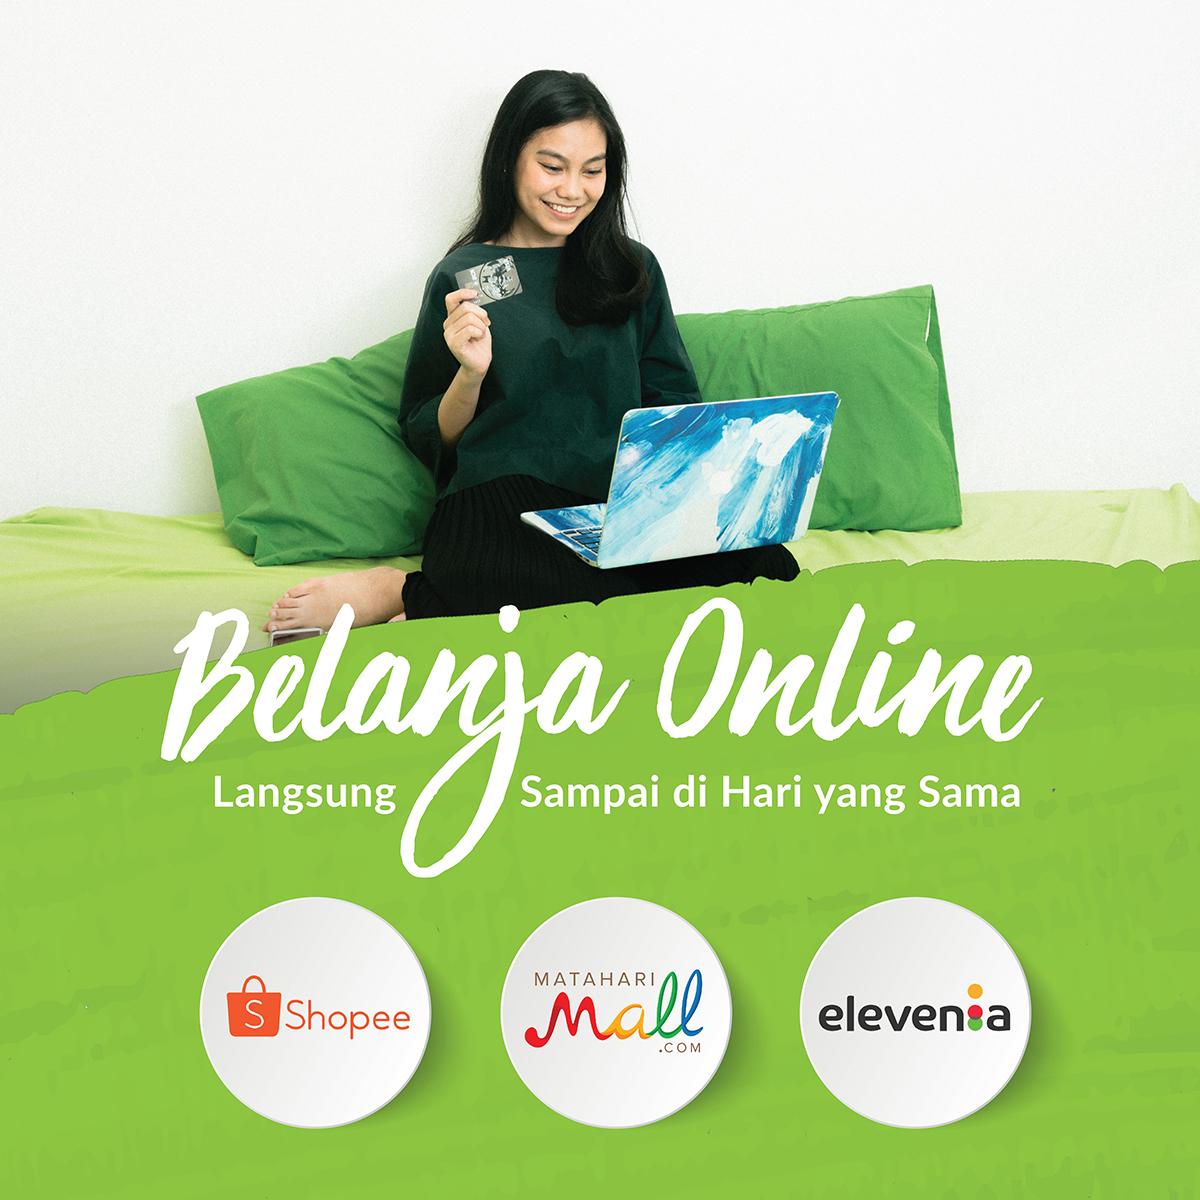 Kini Giliran MatahariMall, Shopee dan Elevenia Menjadi Partner E-commerce GO-SEND